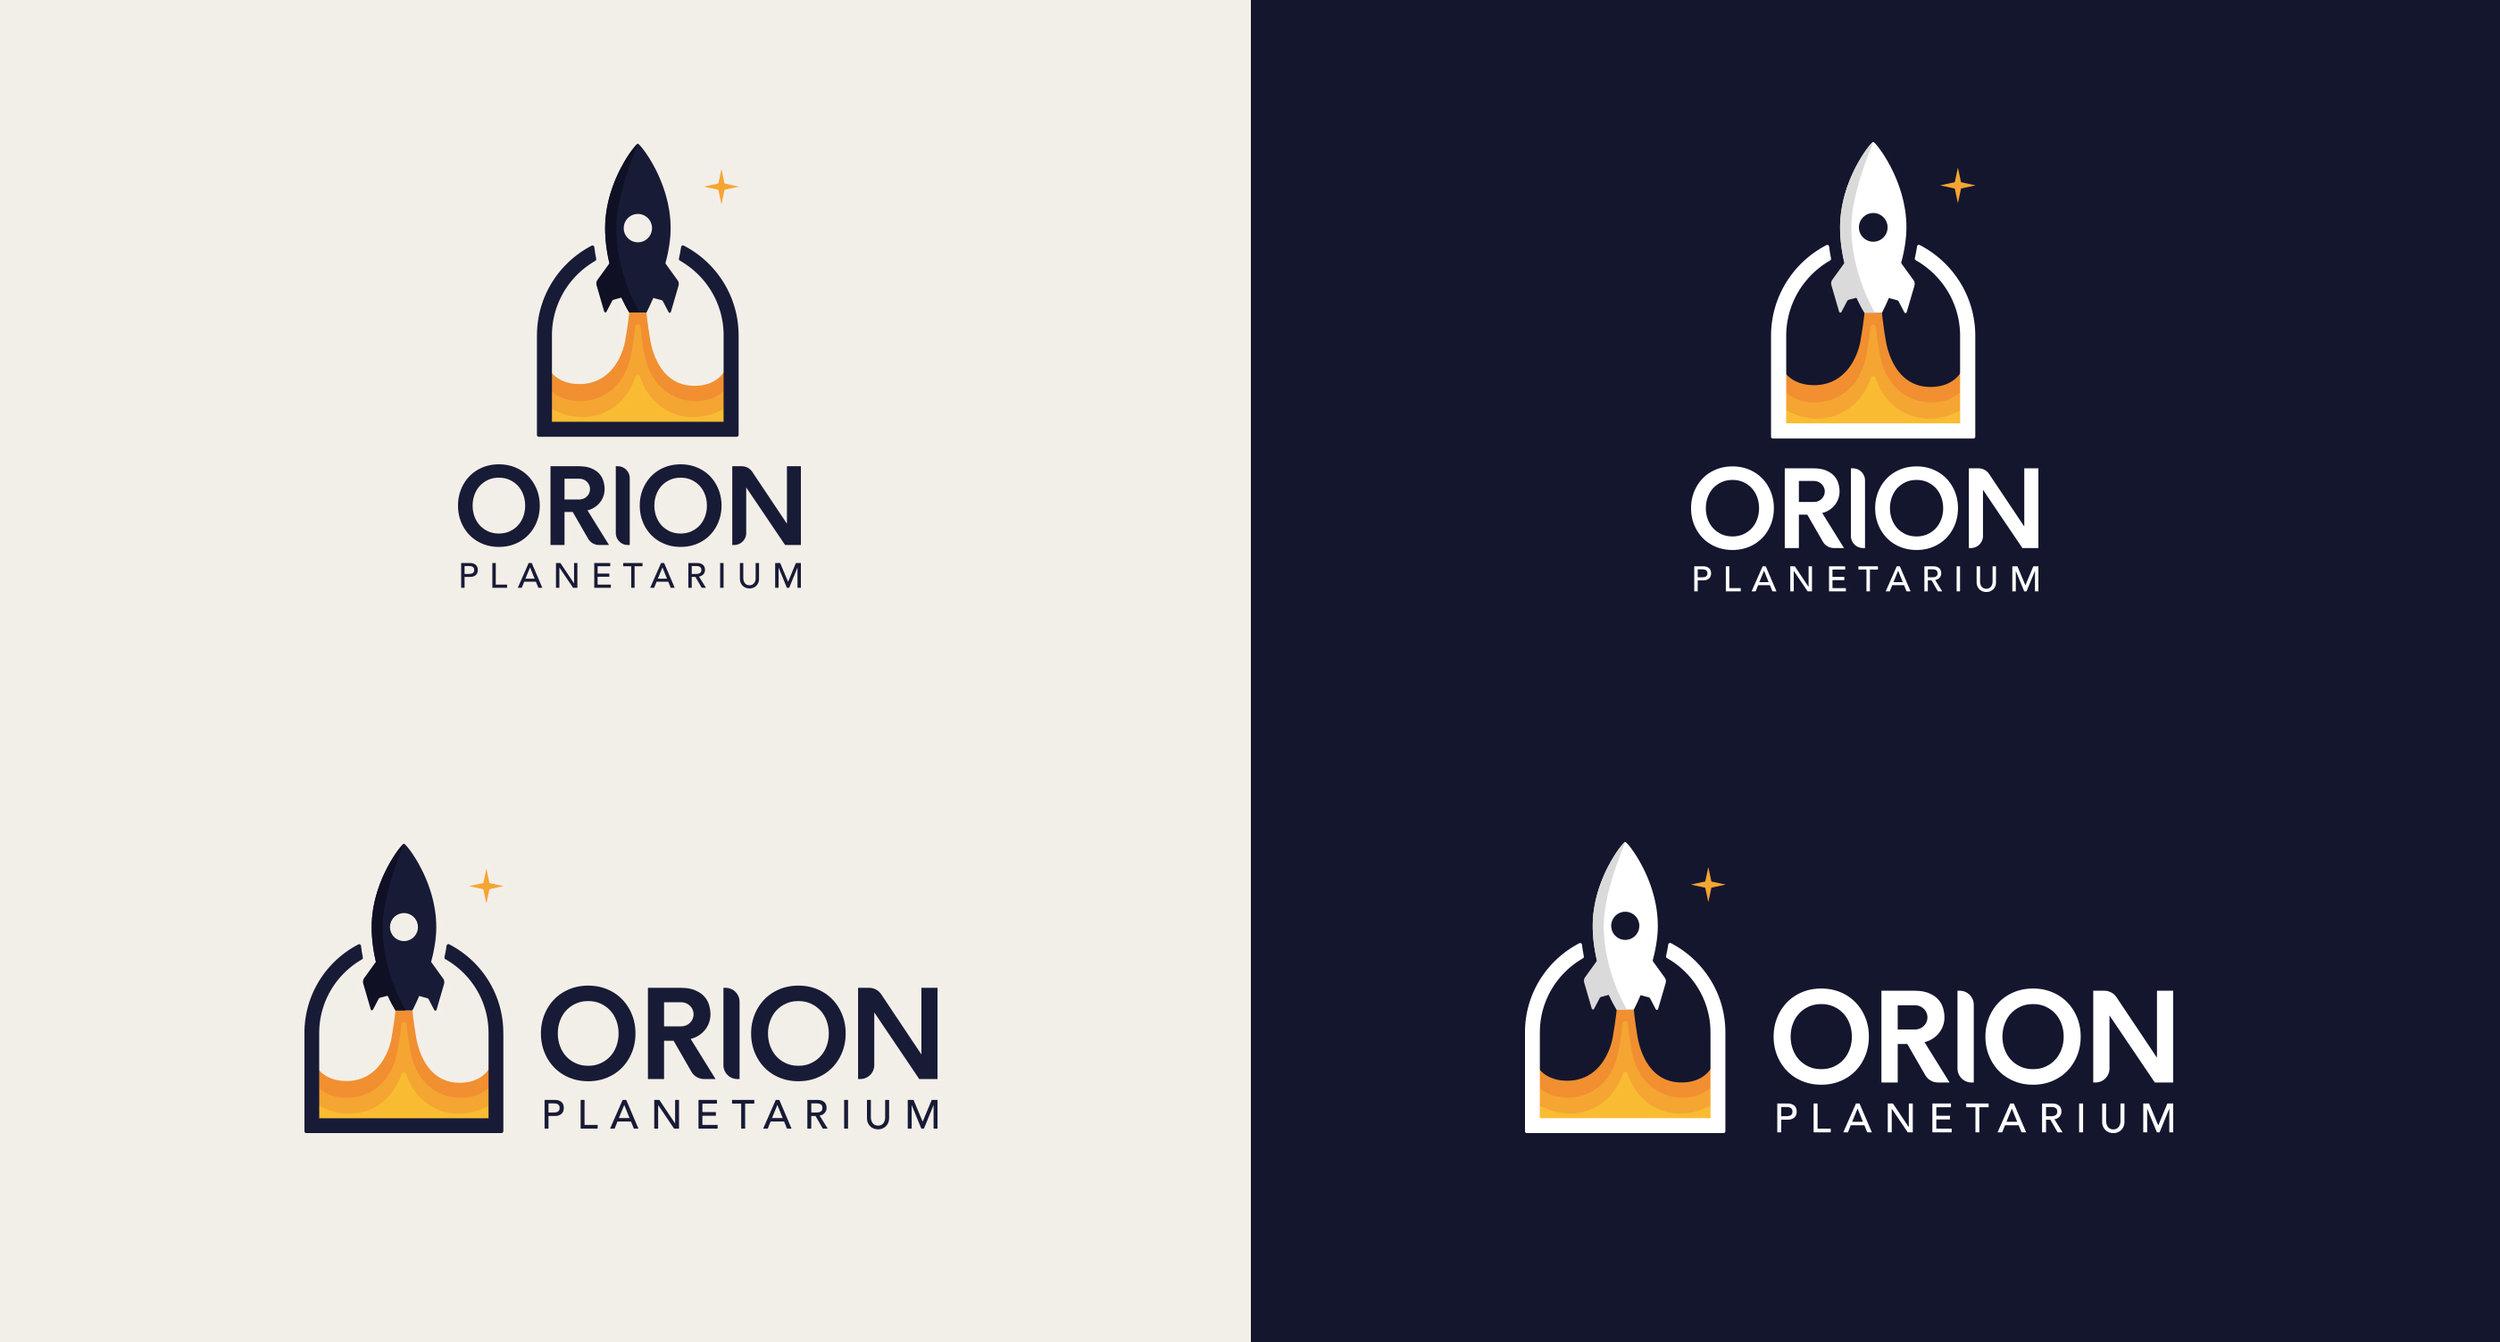 Orion Planetarium Visual Identity Christian Lank